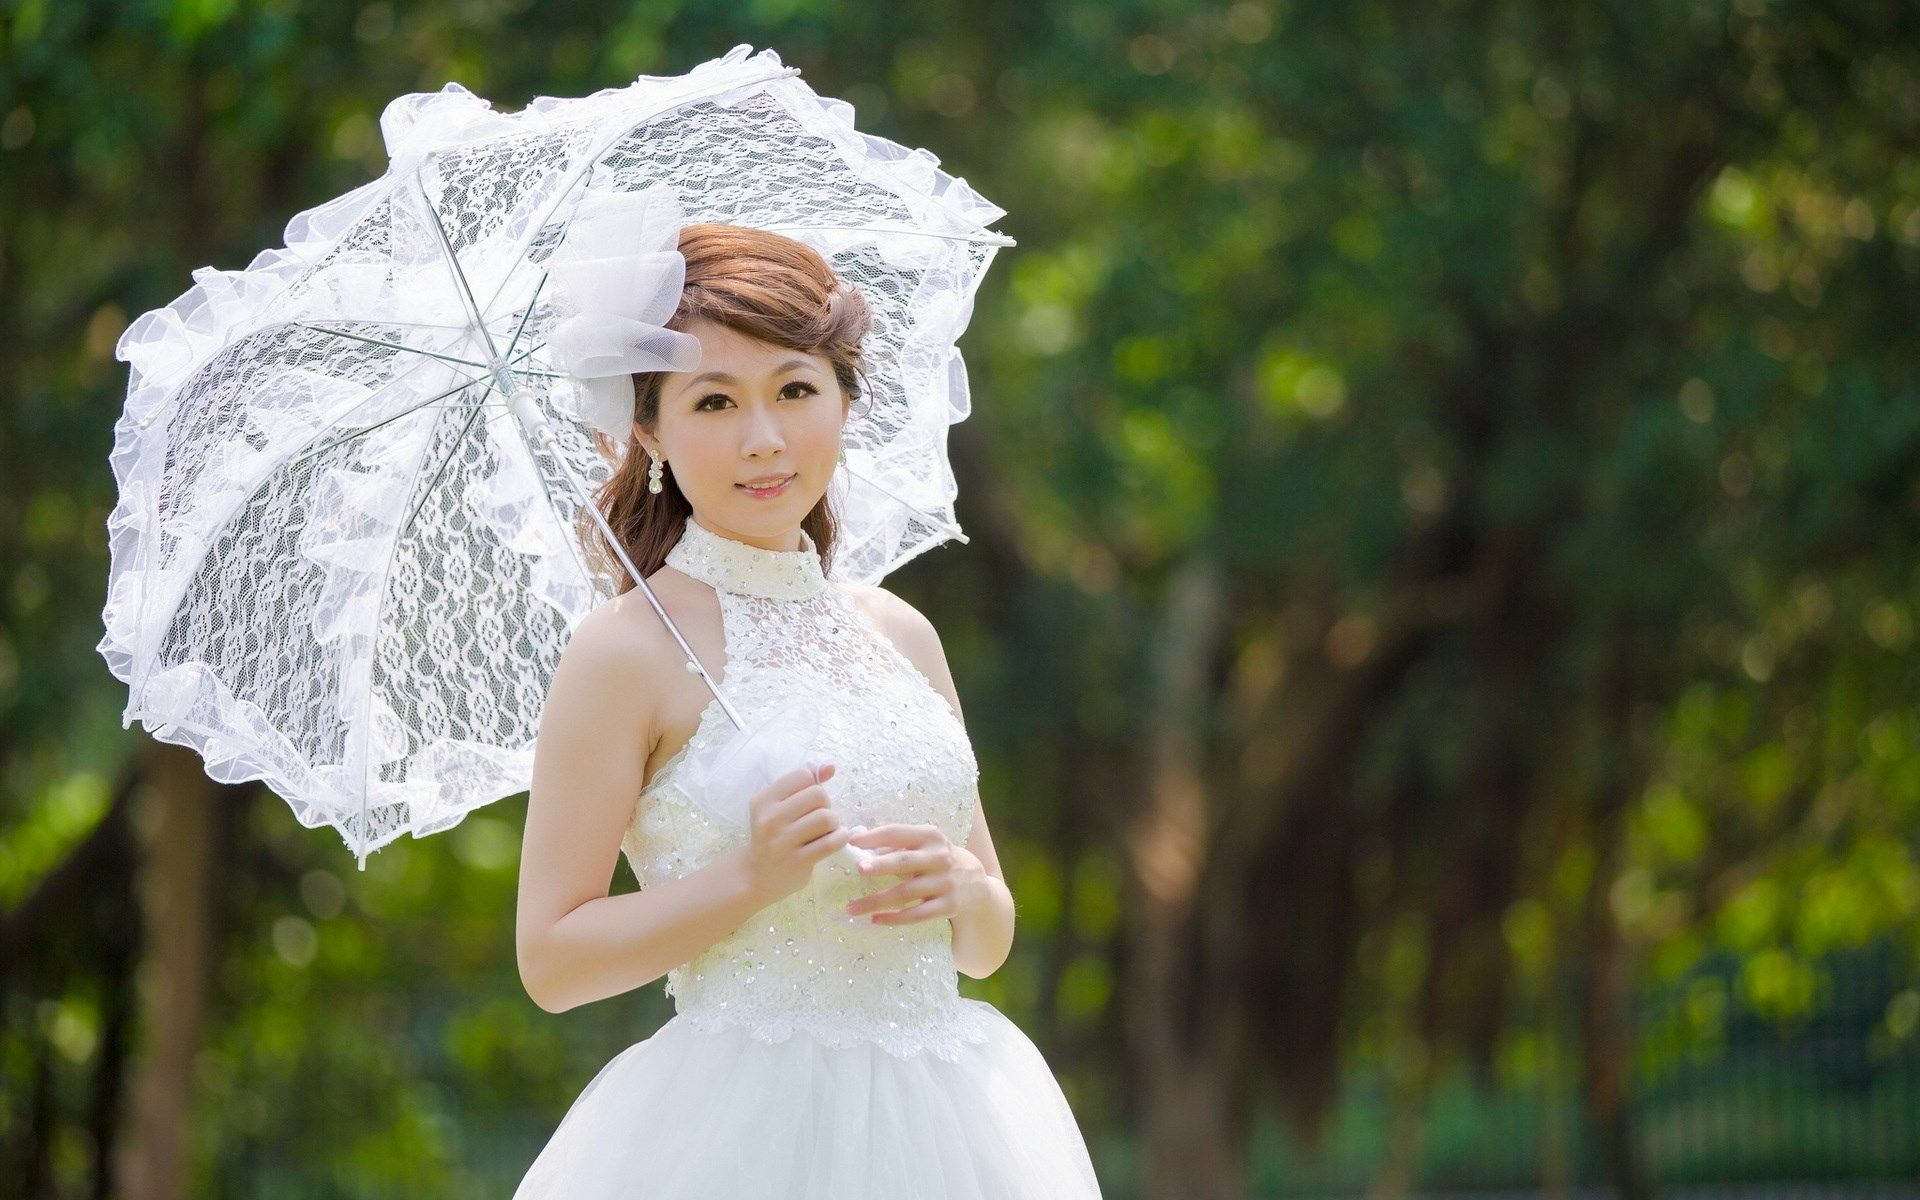 Willow Jones - Free download bride picture - 1920x1200 px